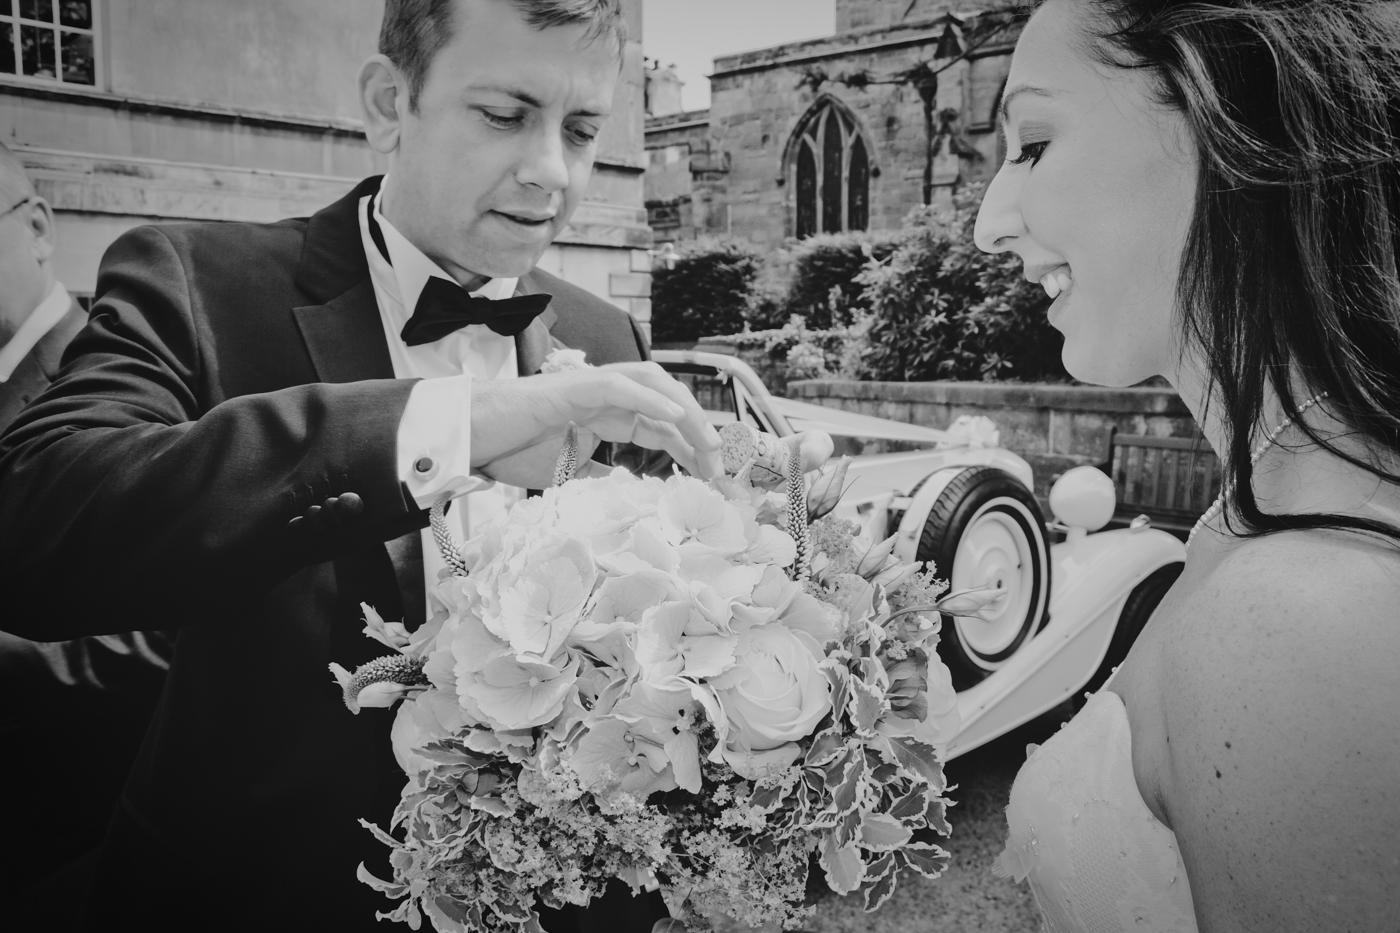 133 - Abi and Chris at Kedleston Hall - Wedding Photography by Mark Pugh www.markpugh.com - 5586.JPG